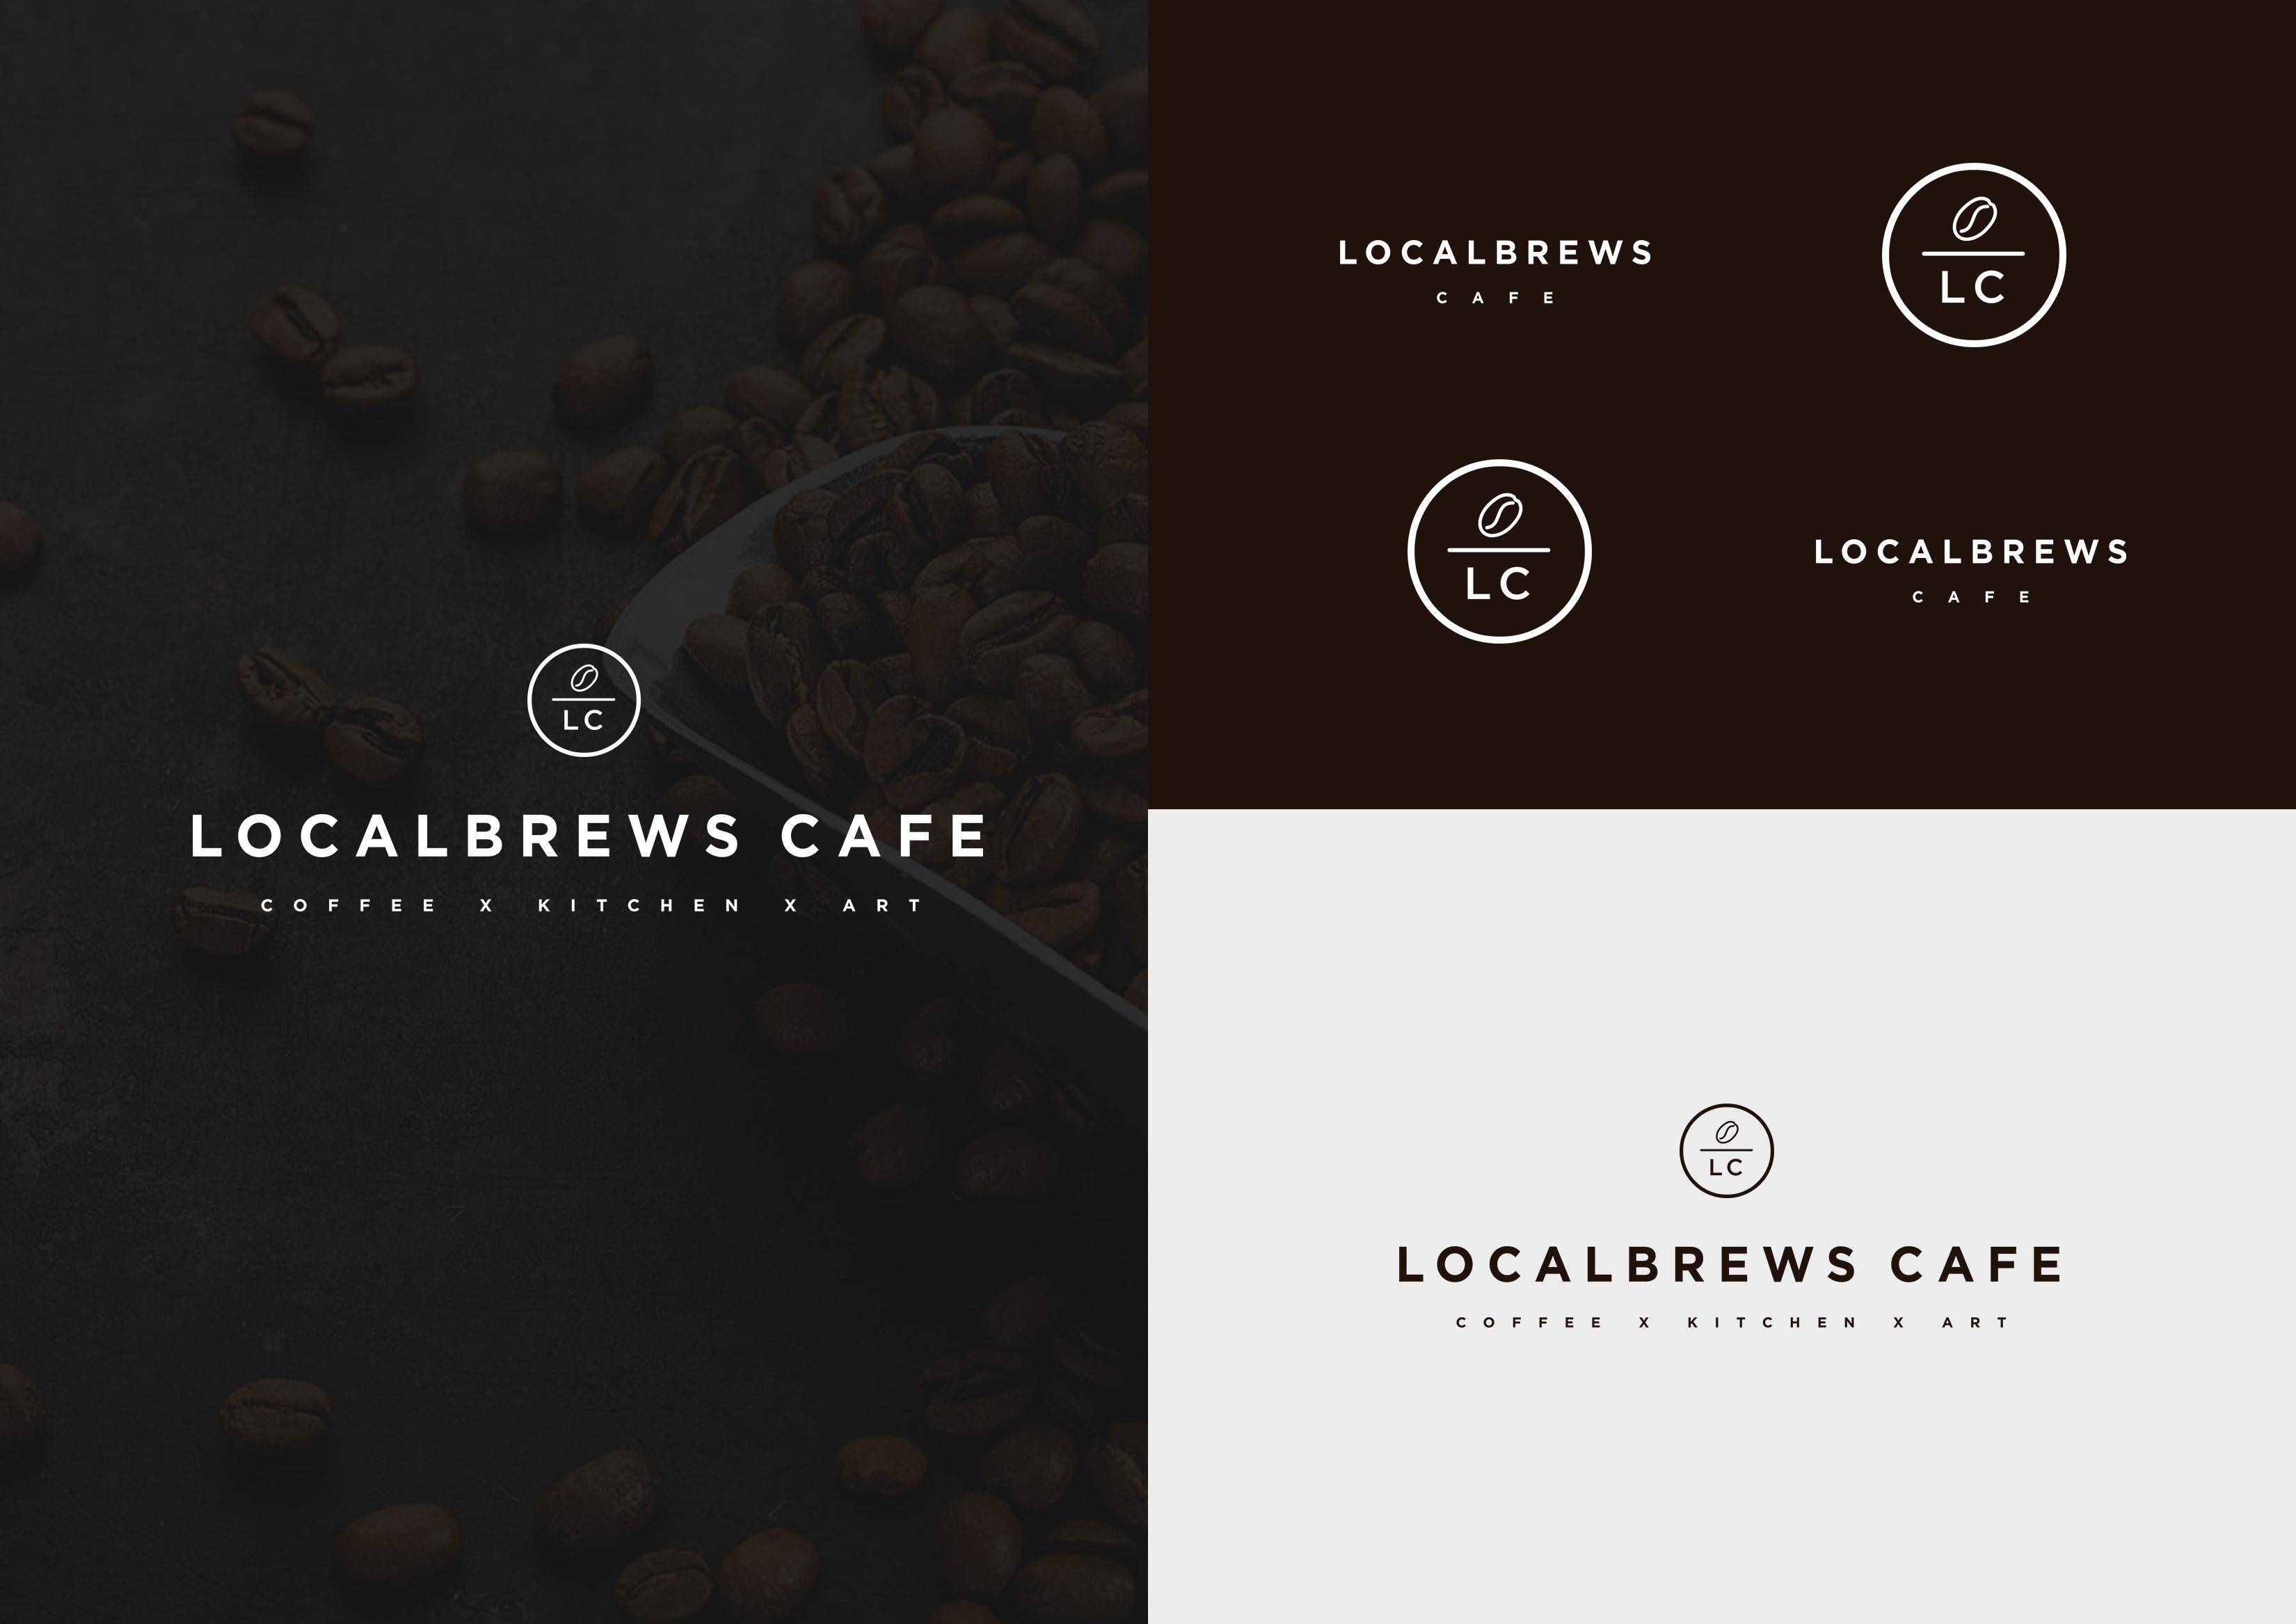 Localbrews-3-Application